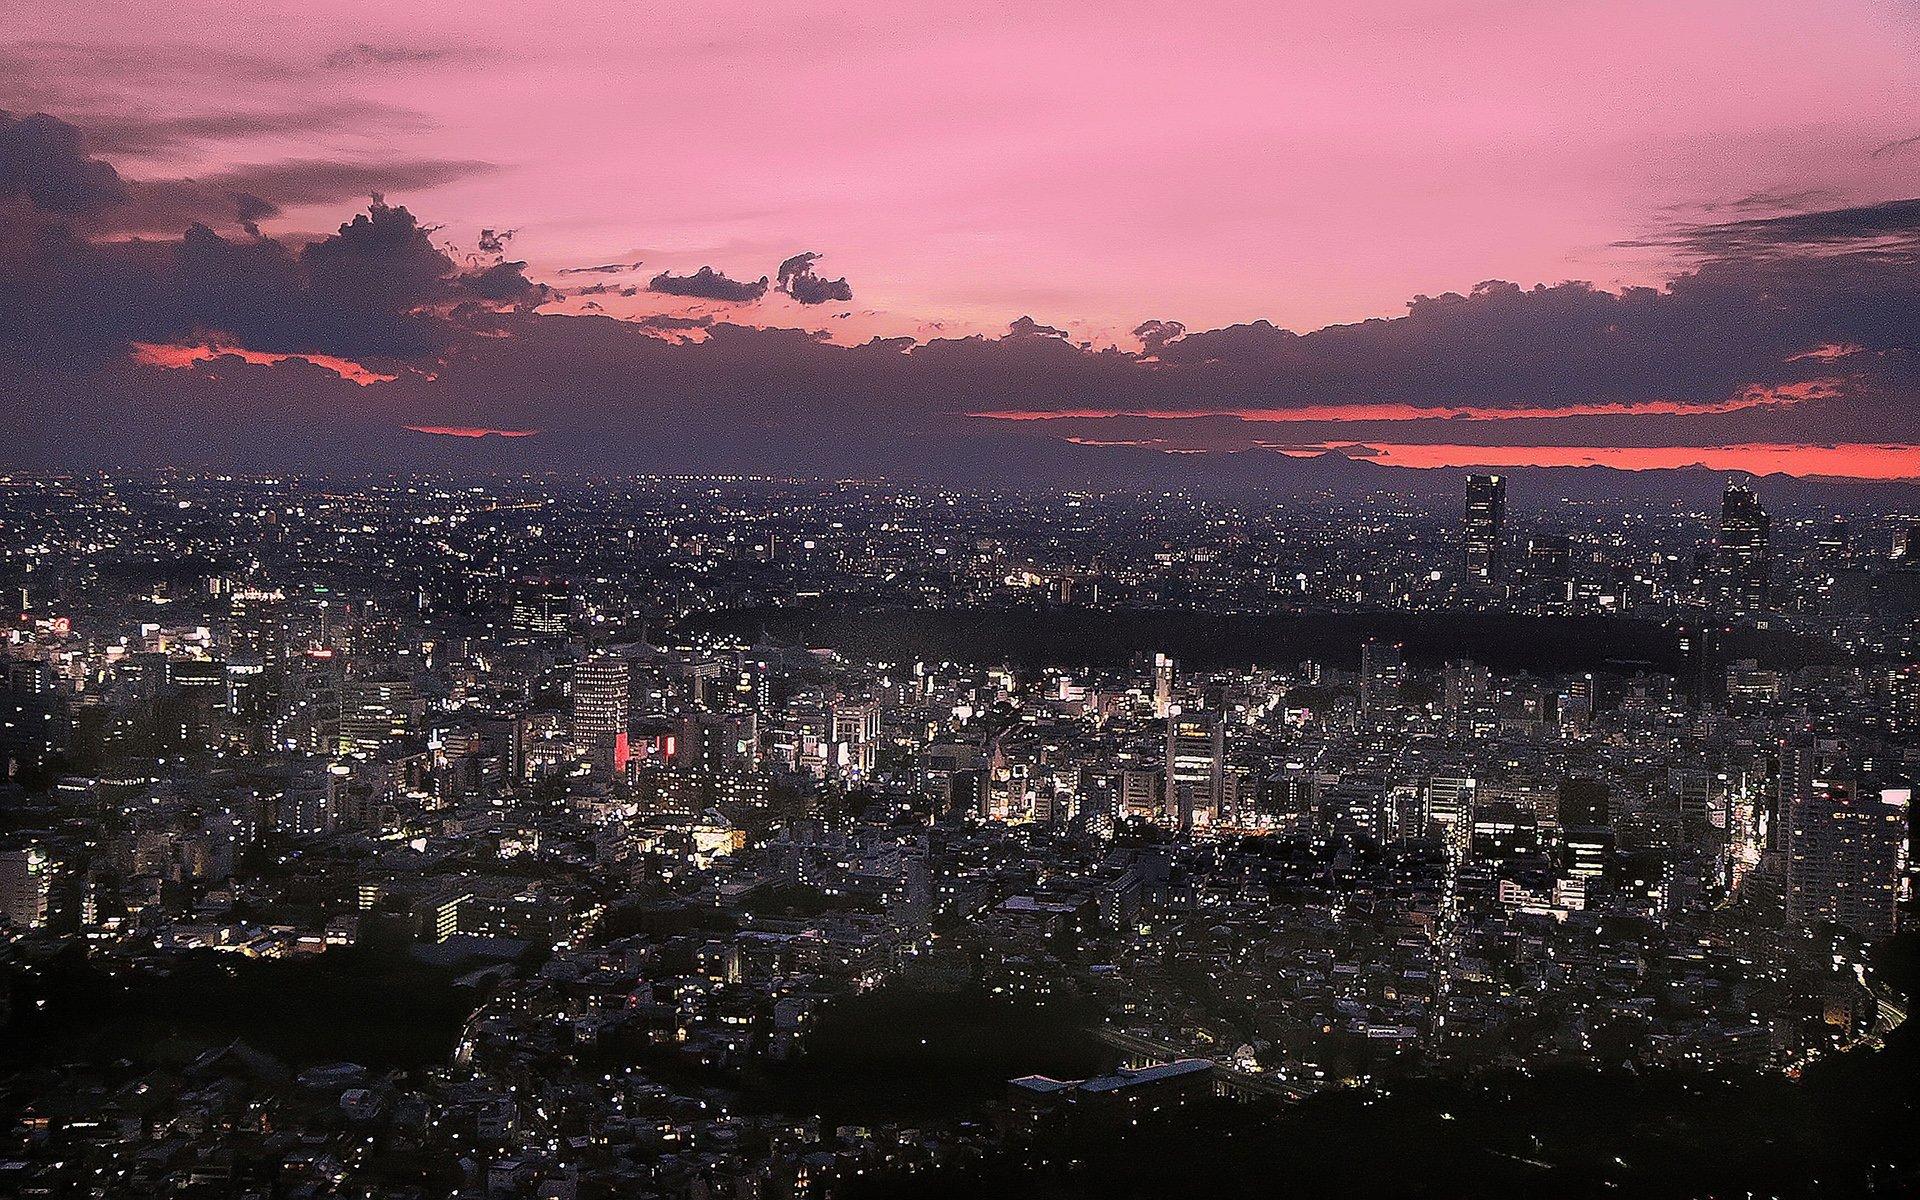 japonya kızıl gökyüzü